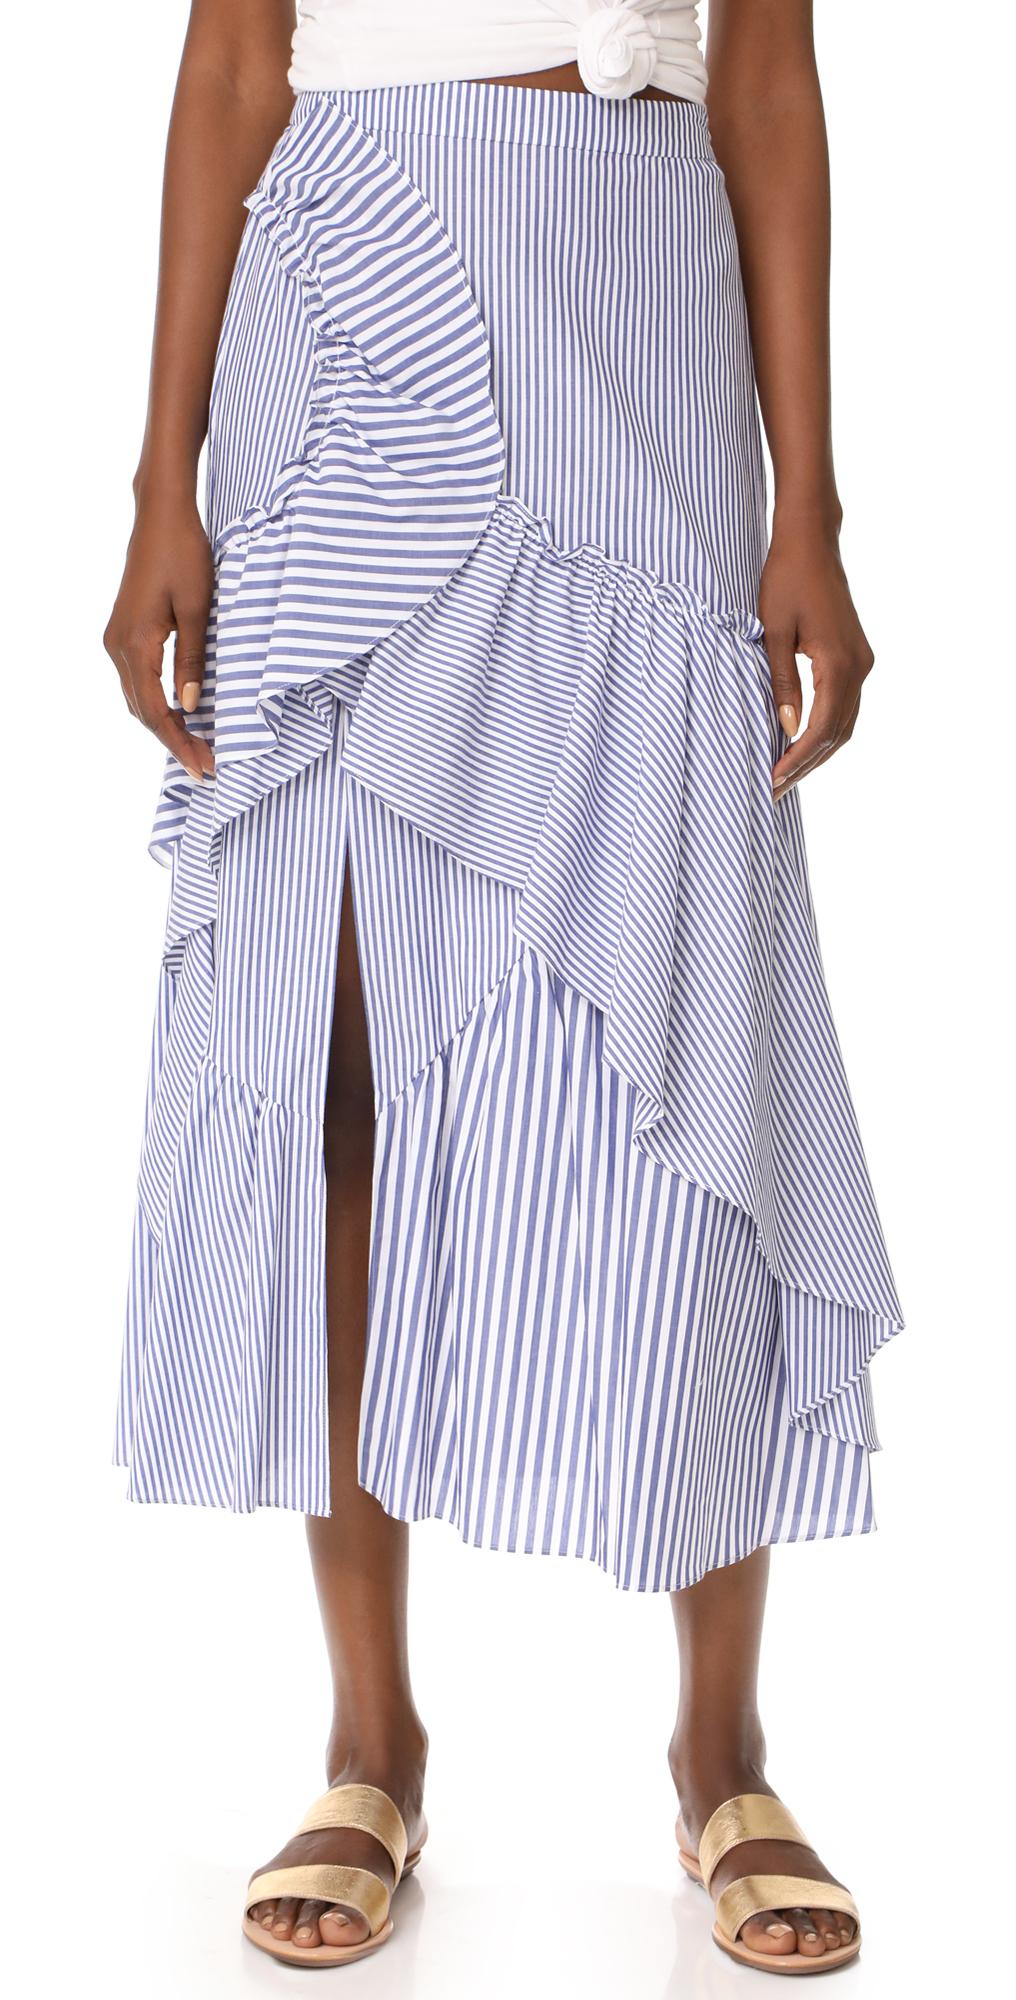 Menswear Stripe Jules Skirt Tanya Taylor